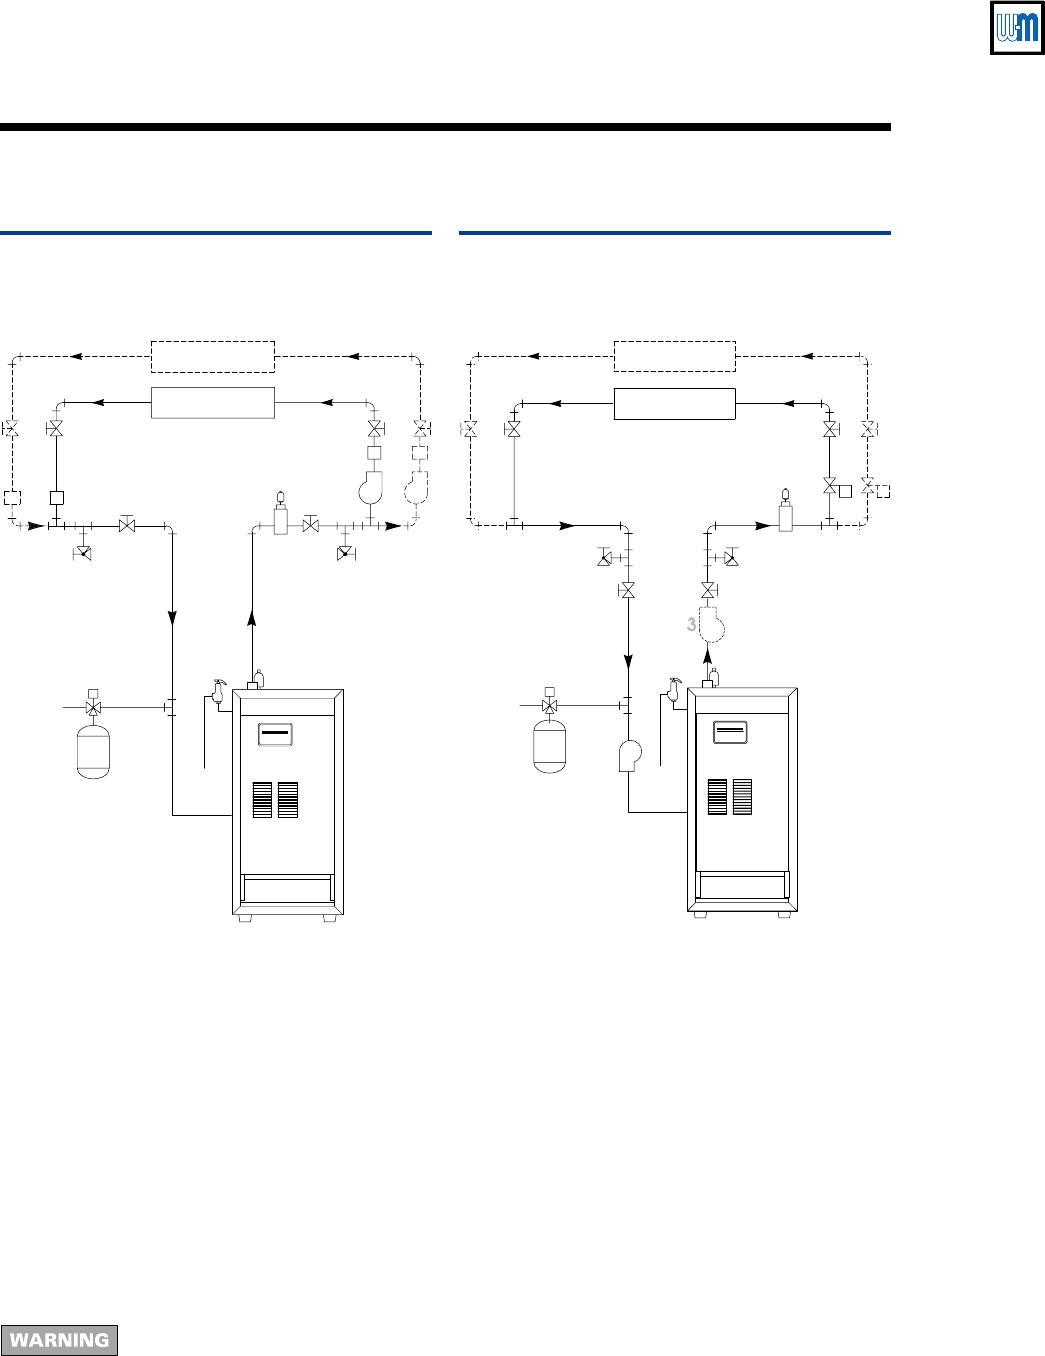 Weil Mclain Vent Damper Wiring Diagram Get Free Image About Wiring